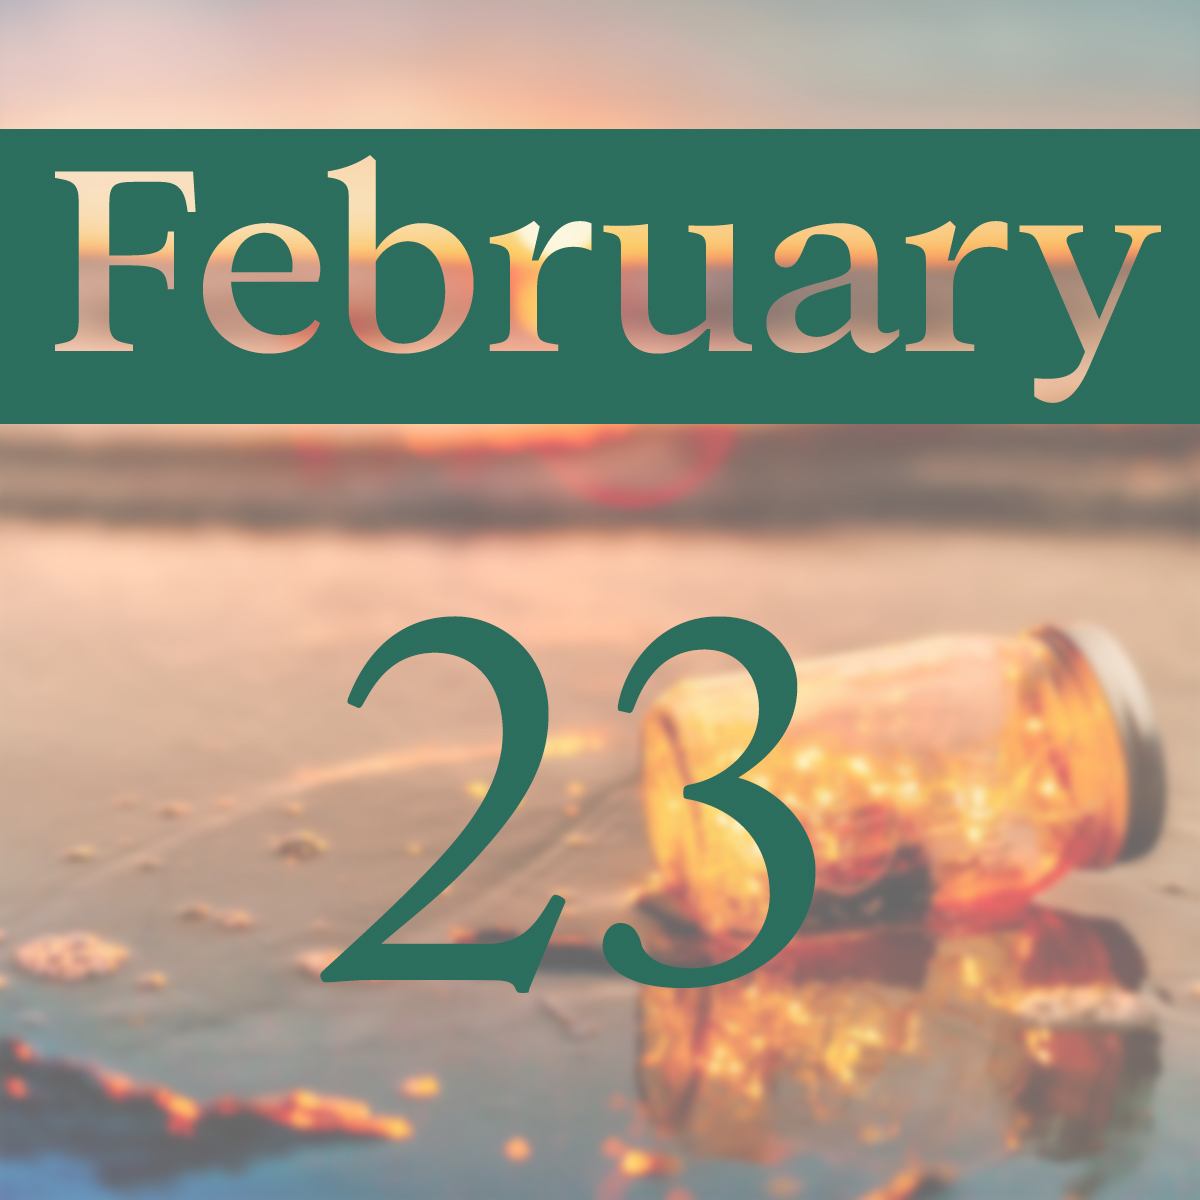 Sunday, February 23rd